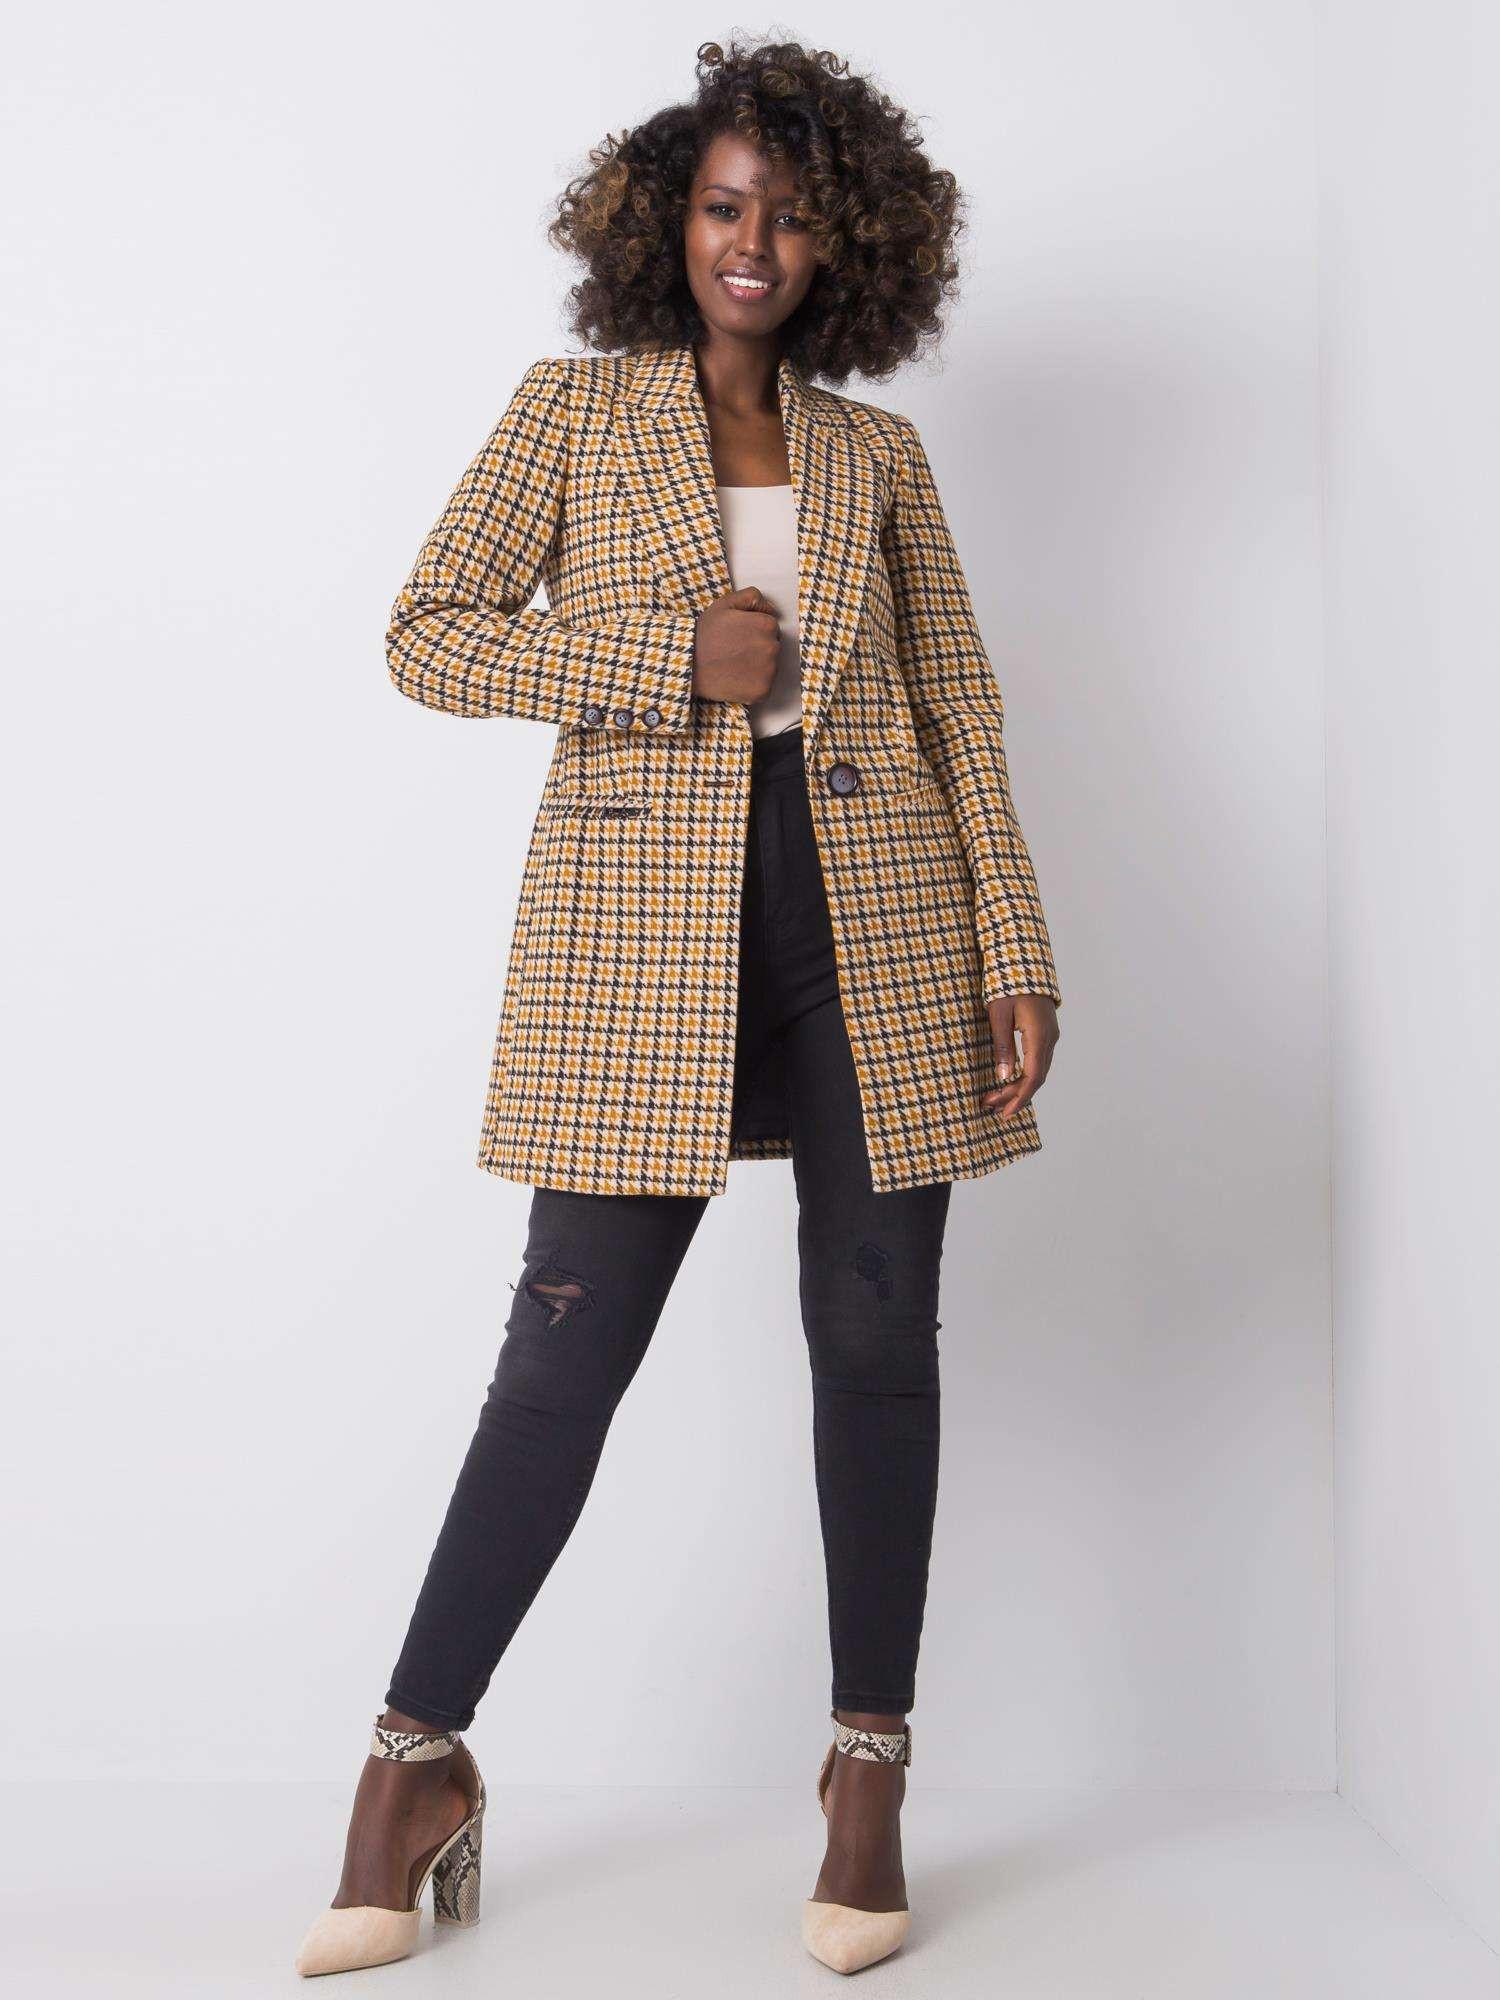 Dámský hnědý a černý kabát XL